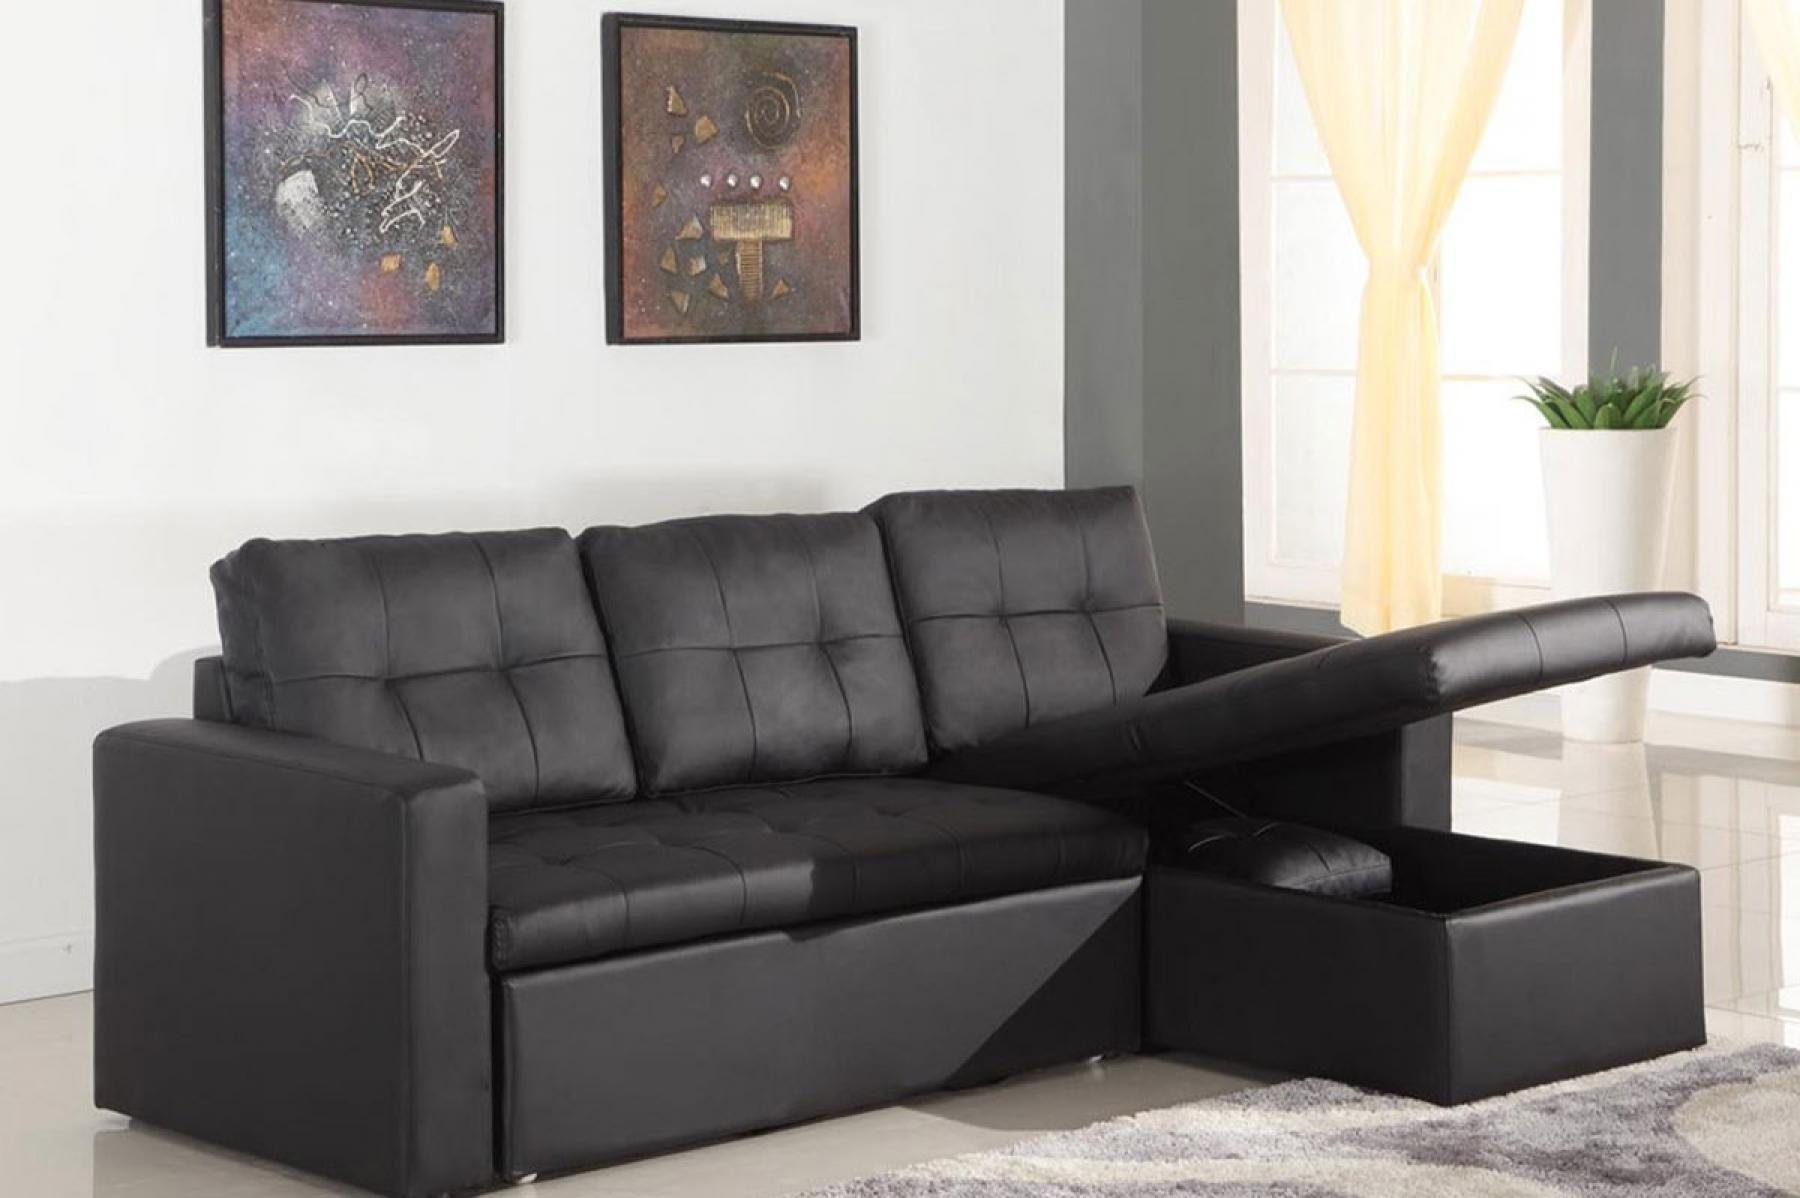 photos canap convertible angle droit. Black Bedroom Furniture Sets. Home Design Ideas